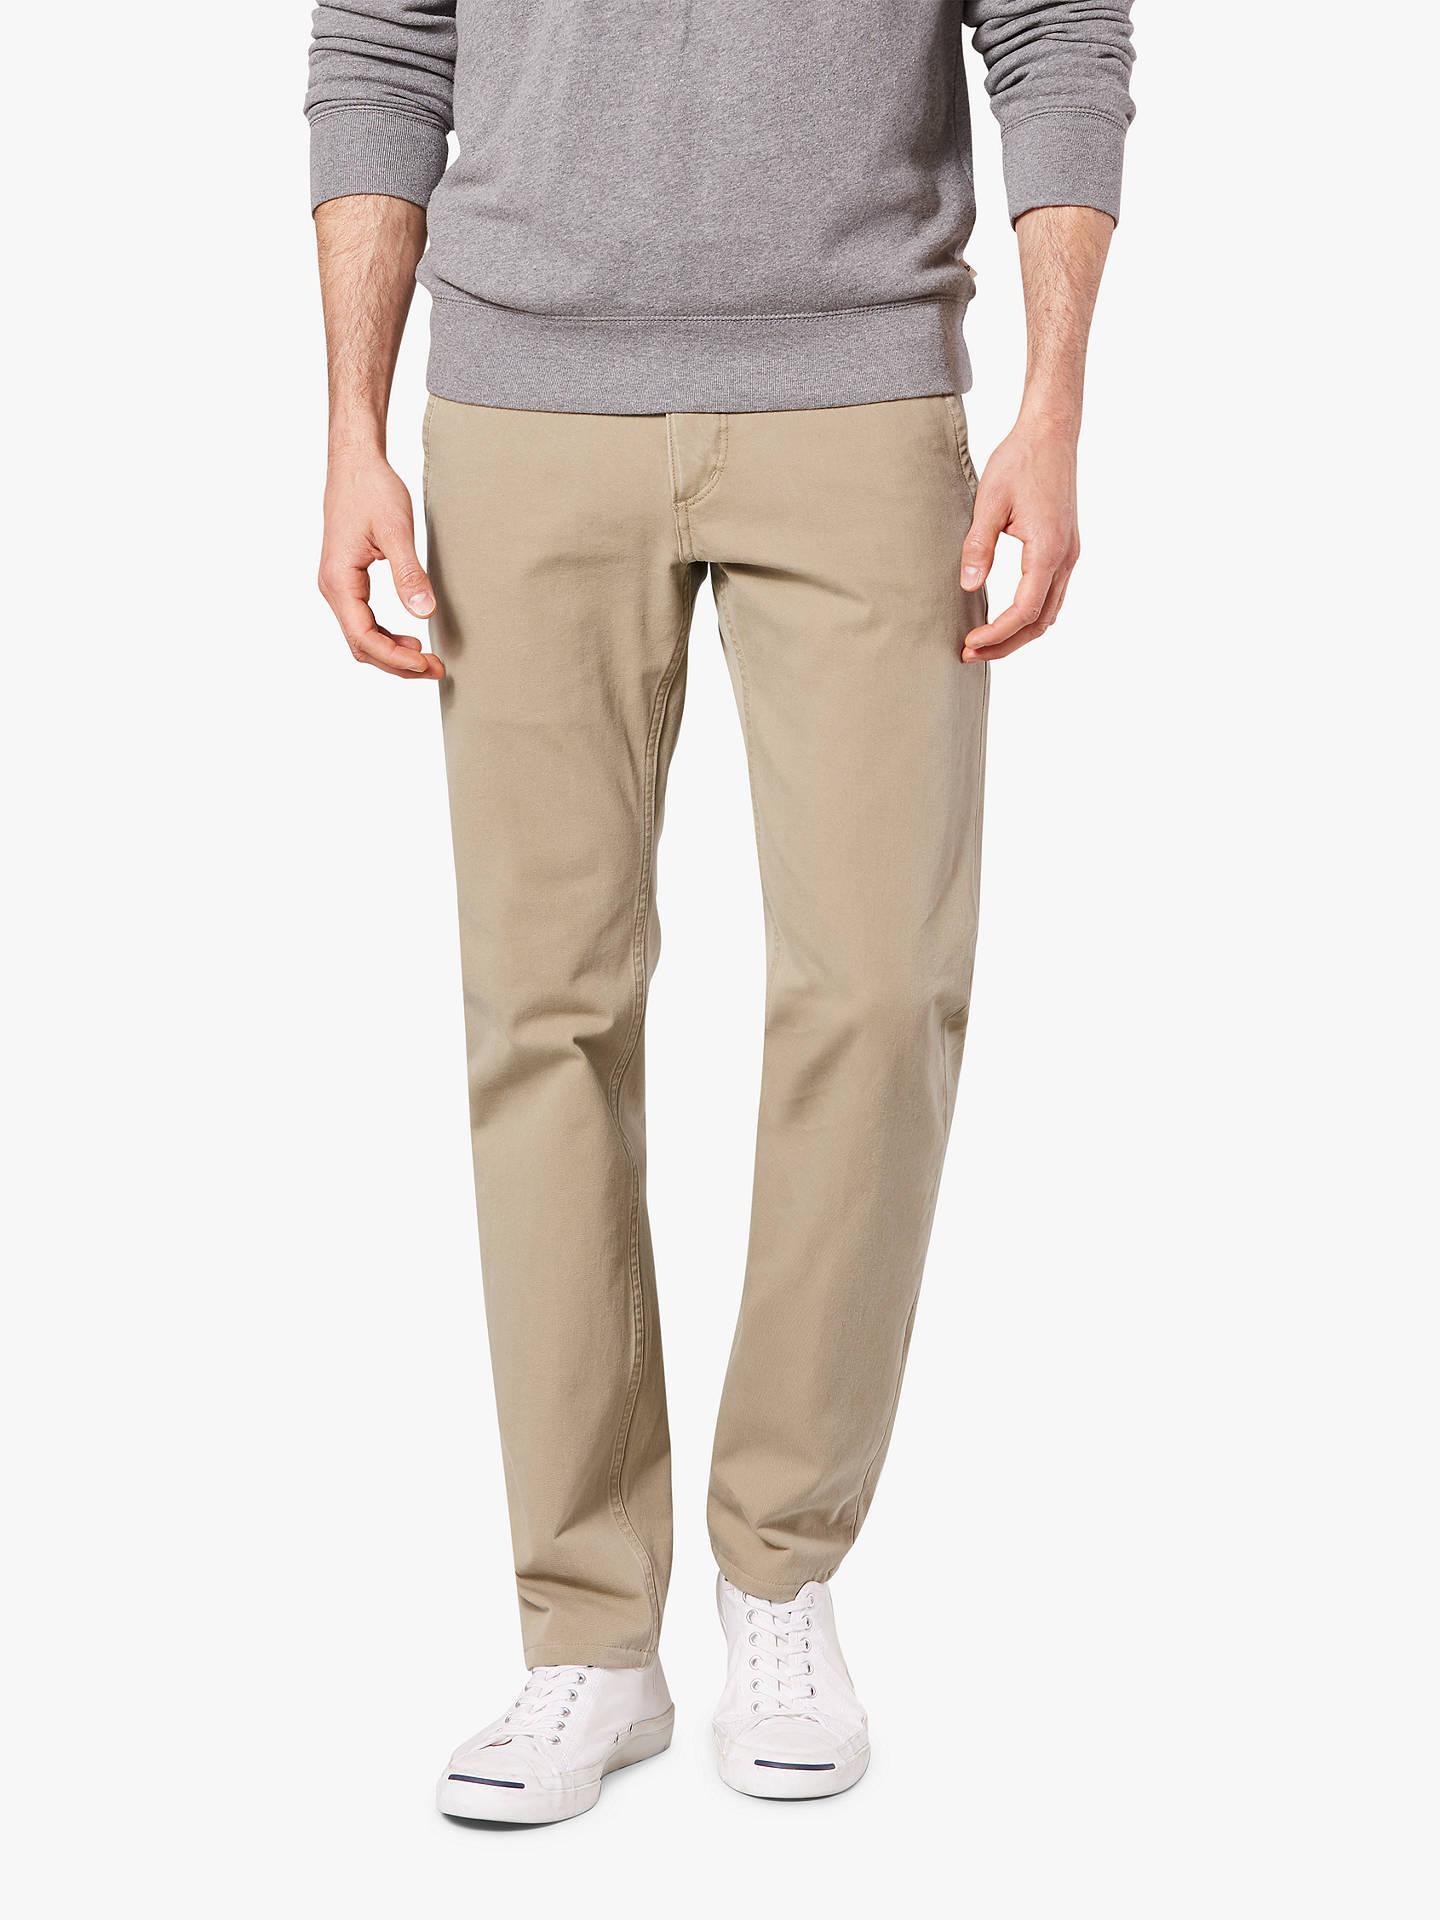 1cc5ed87019bd8 Buy Dockers Alpha Khaki Smart 360 Flex Slim Tapered Trousers, New British  Khaki, 32S ...